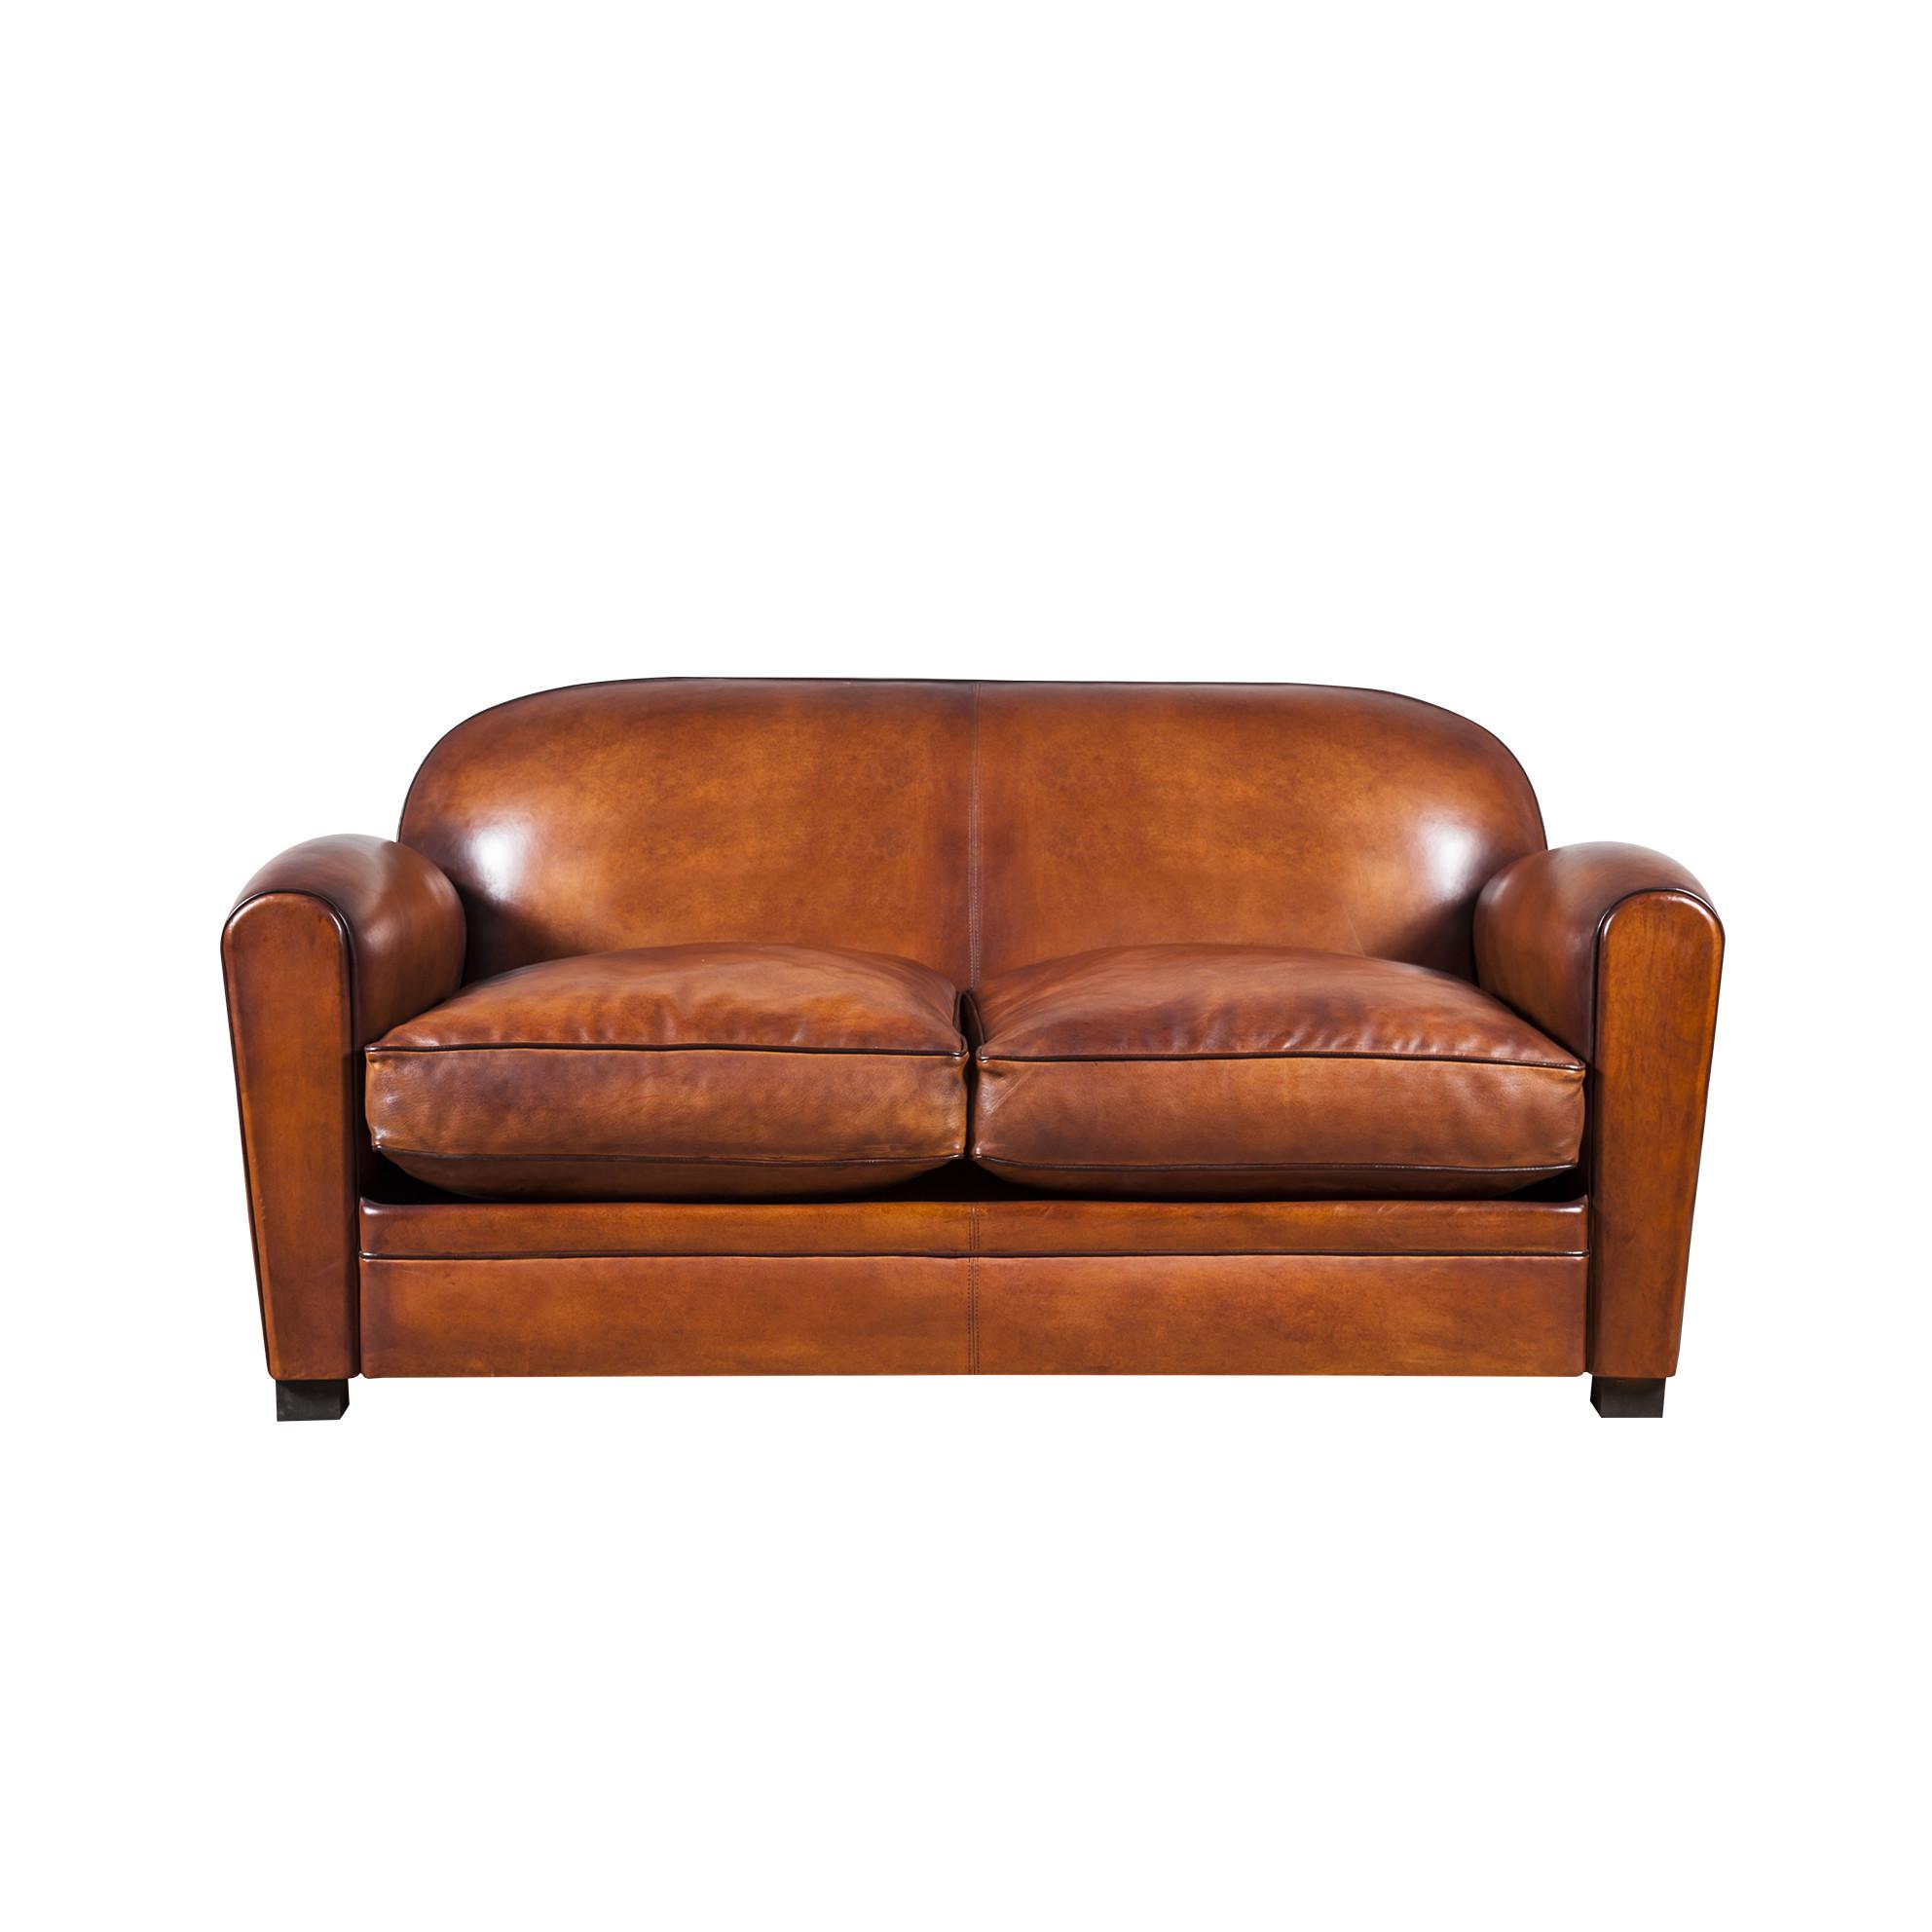 Fine Club Sofa Leather Le Bourbon 2 Seater Sofa French Leather Sofa Bejannin Paris Frankydiablos Diy Chair Ideas Frankydiabloscom